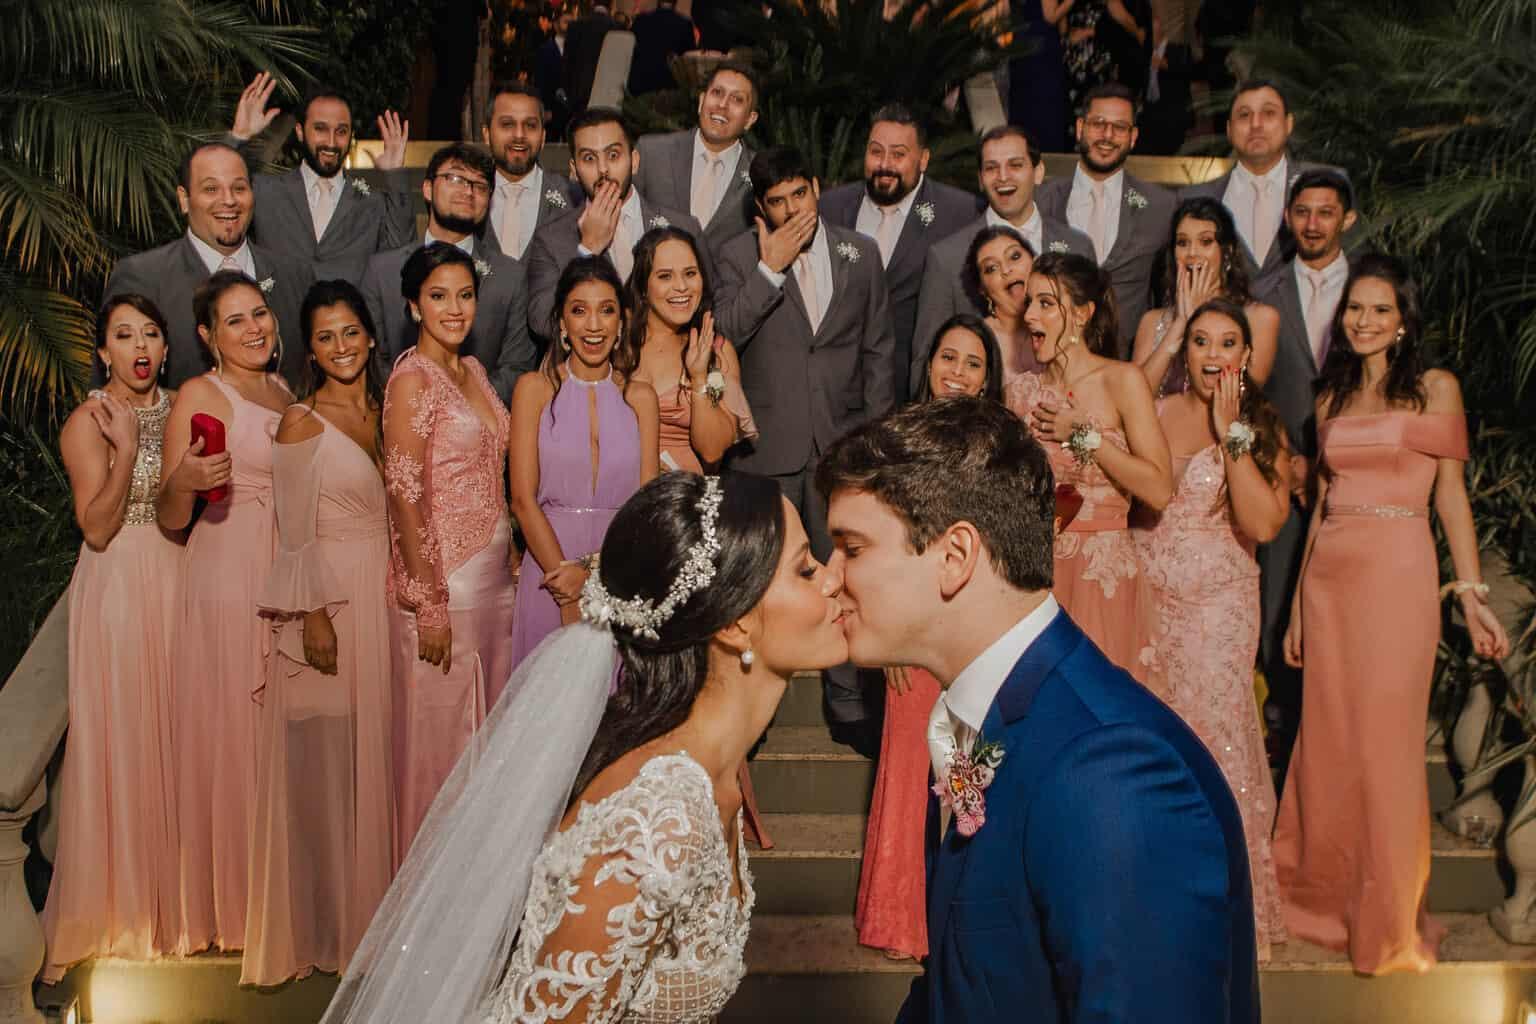 casamento-Beatriz-e-Joao-Fernando-Itaipava-Locanda-Della-Mimosa-padrinhos-Thienny-Tammis184